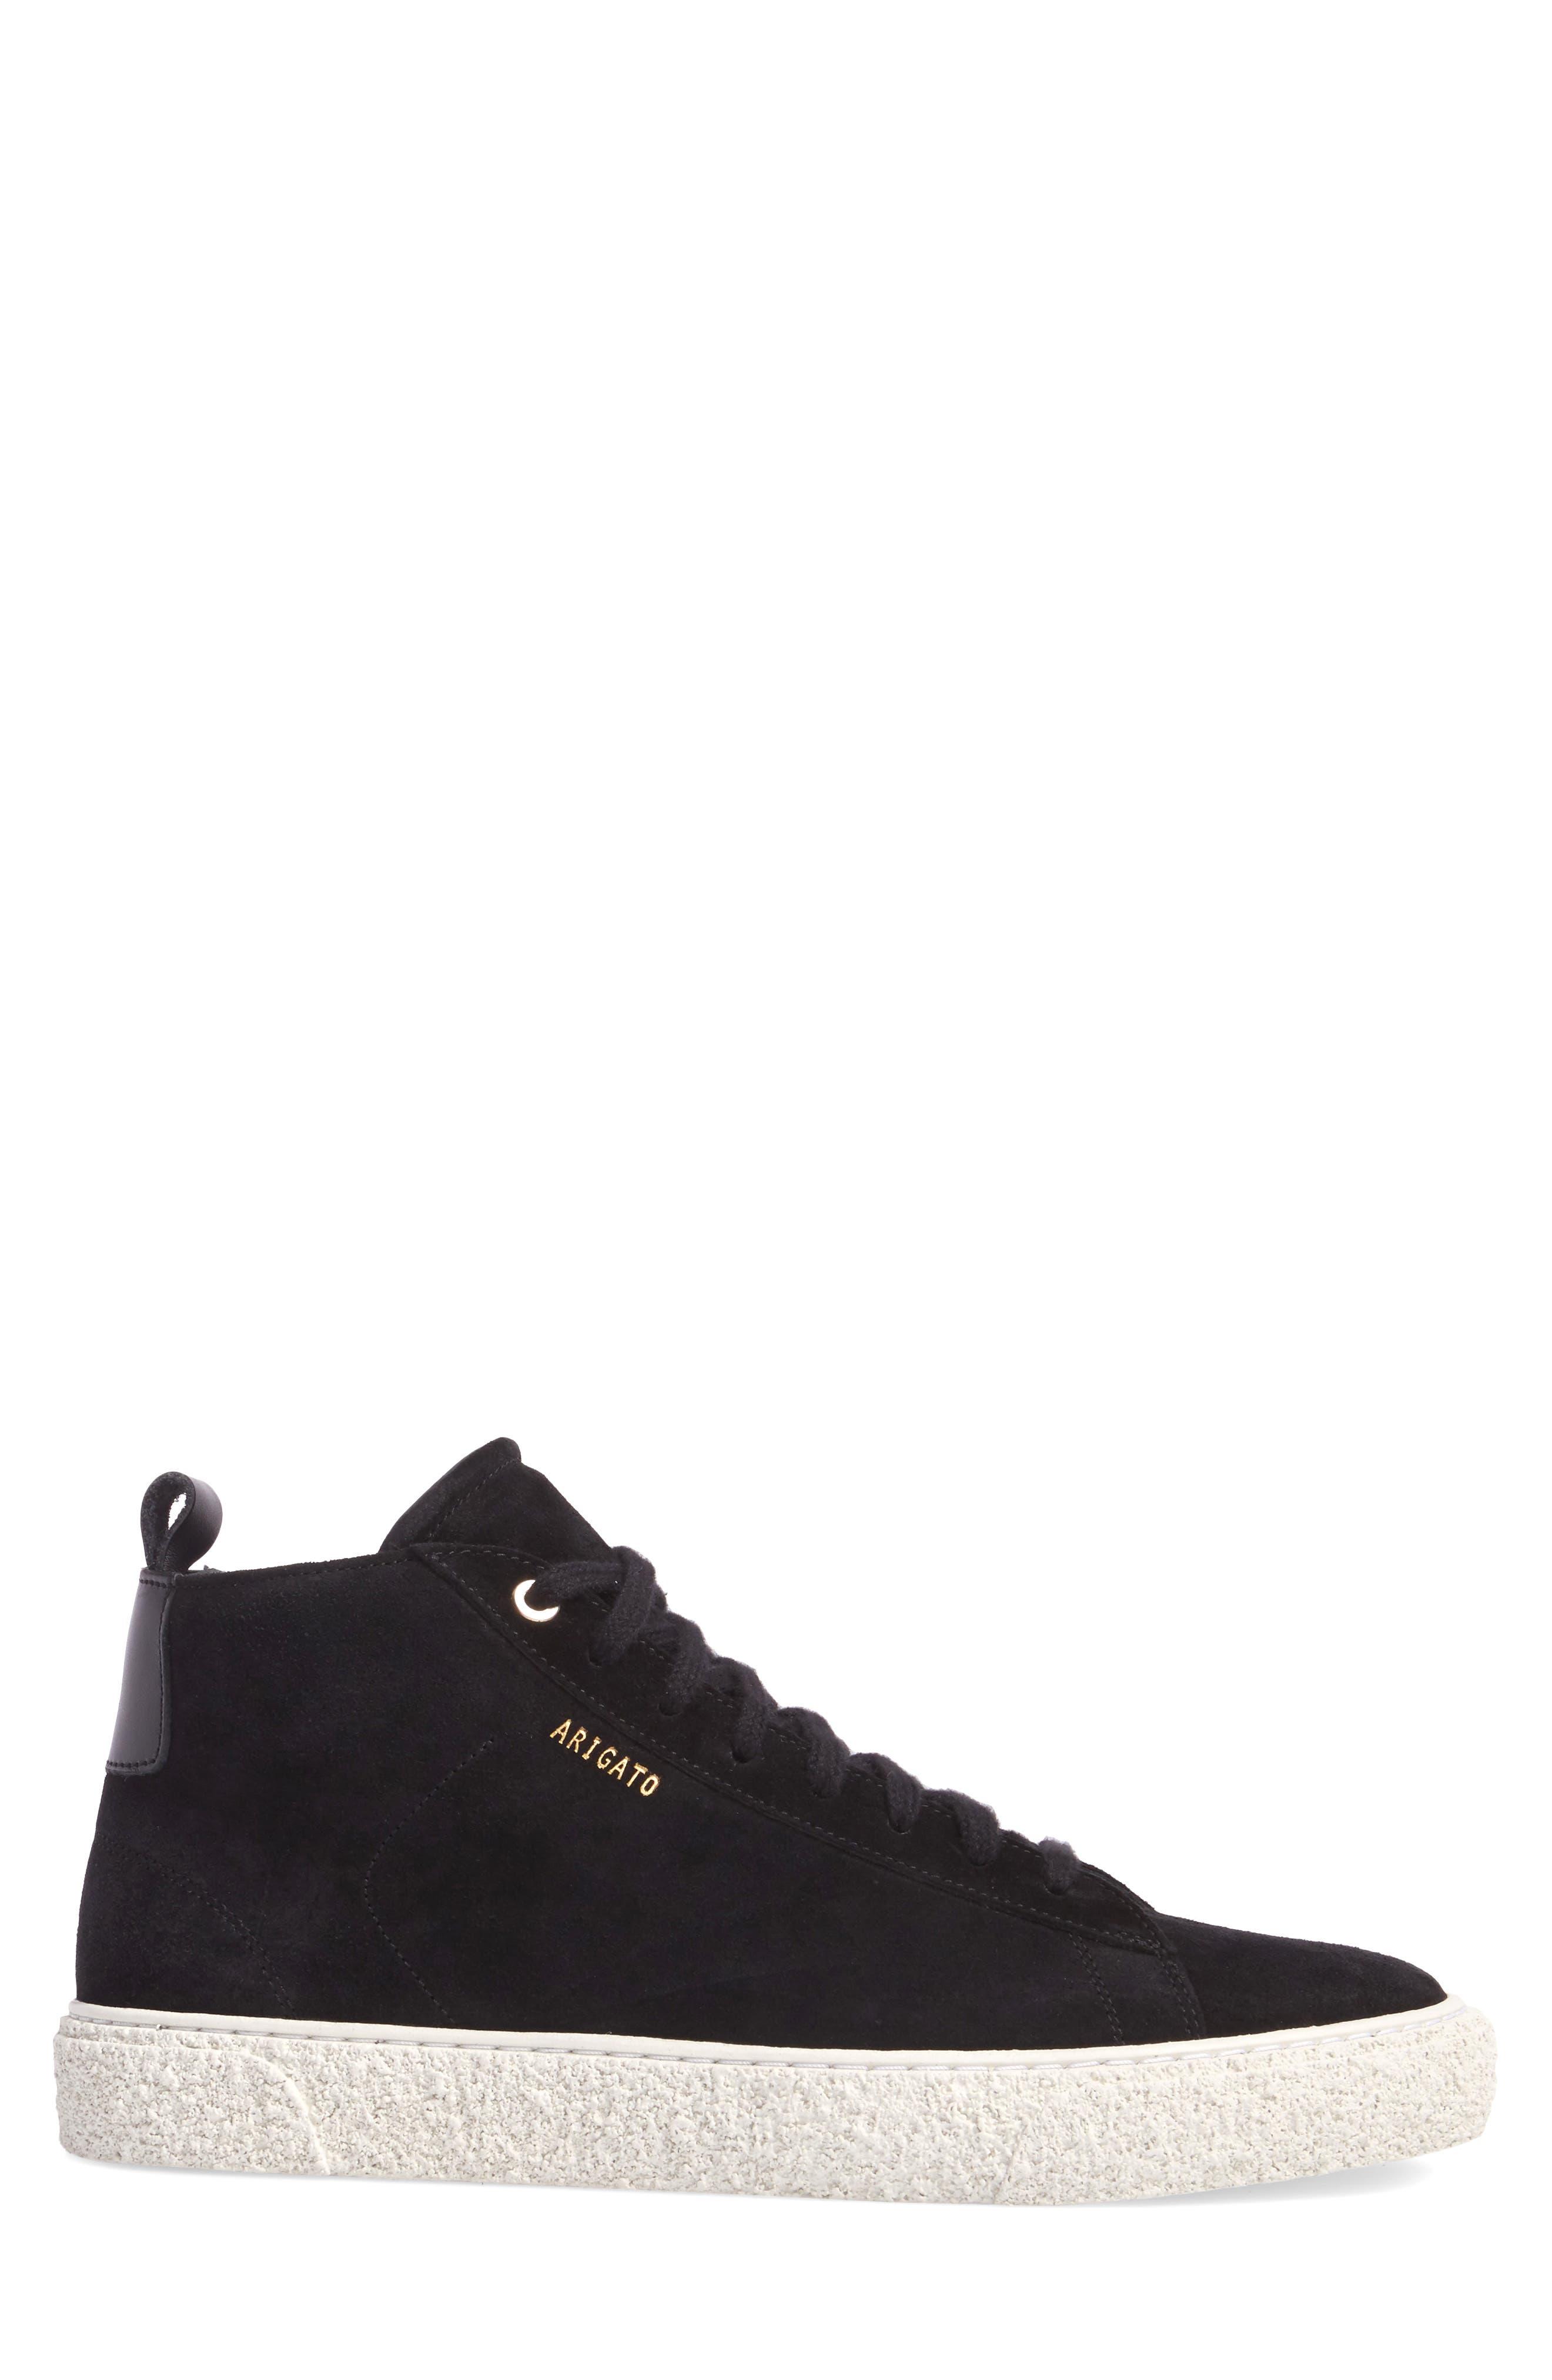 Chukka Sneaker,                             Alternate thumbnail 3, color,                             Black Suede